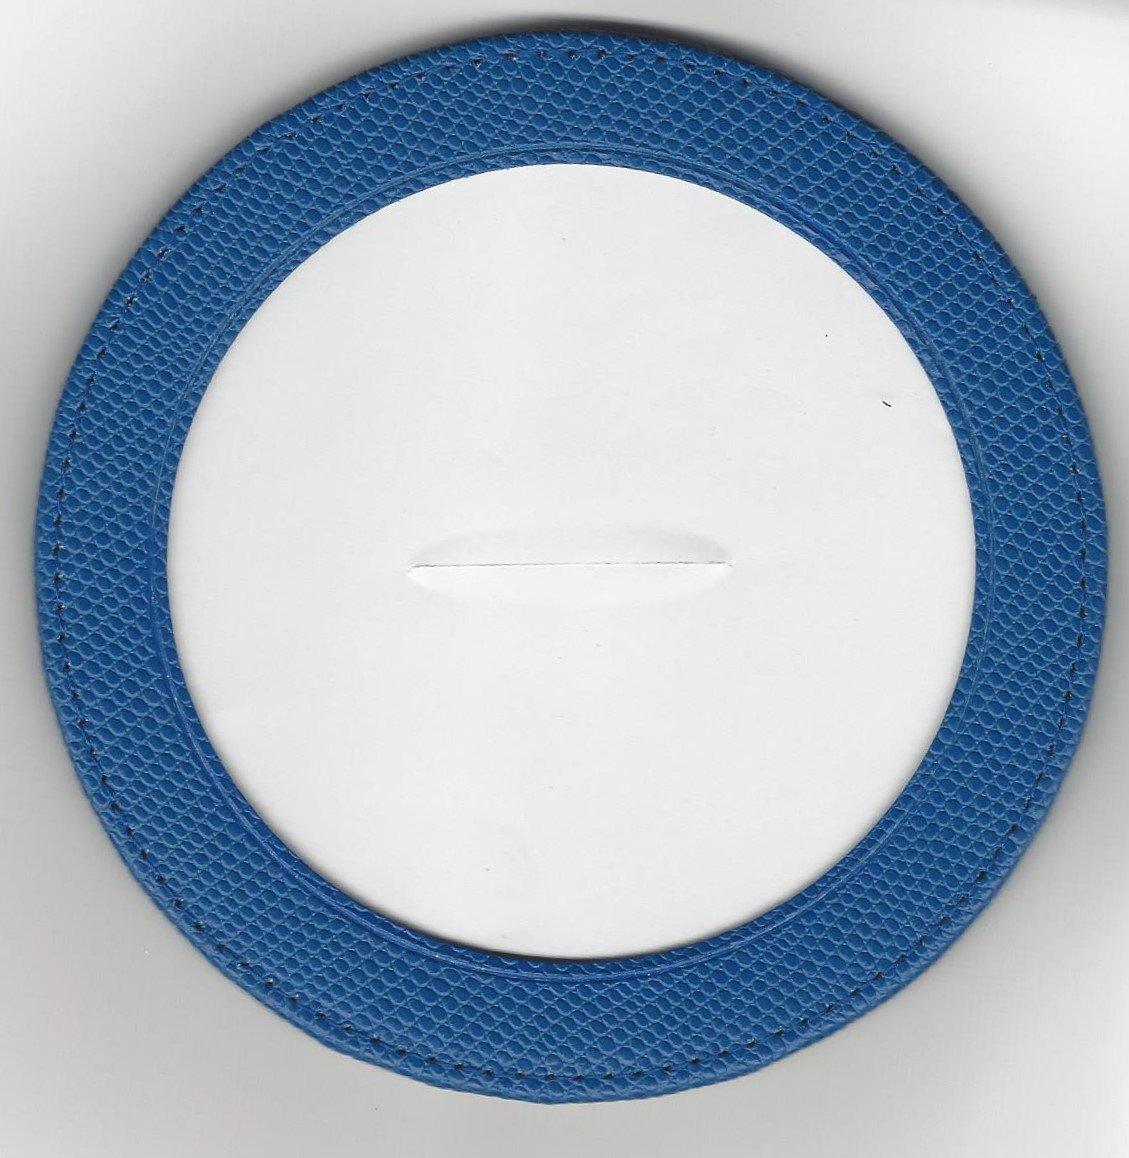 Coaster - Blue